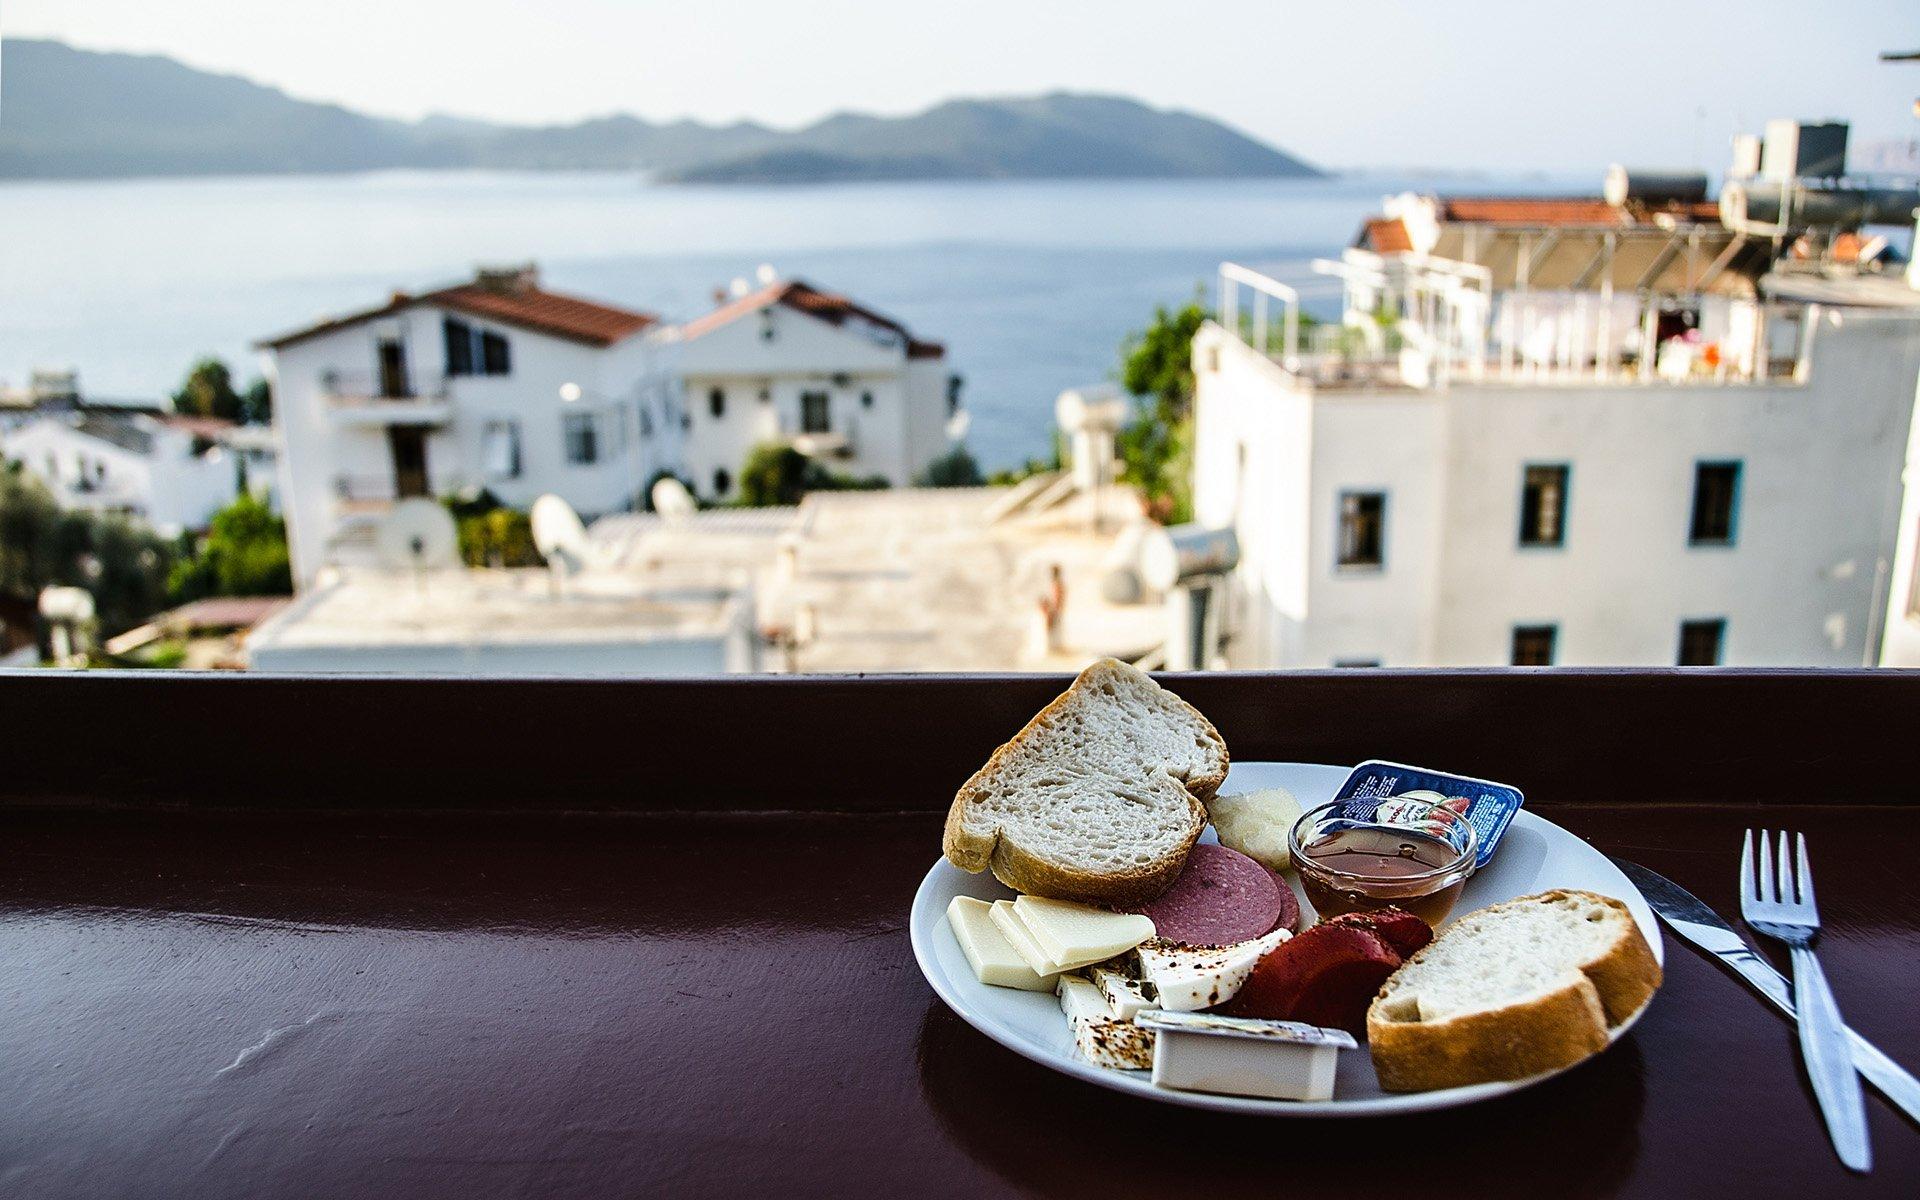 manzaraya karşı kahvaltı